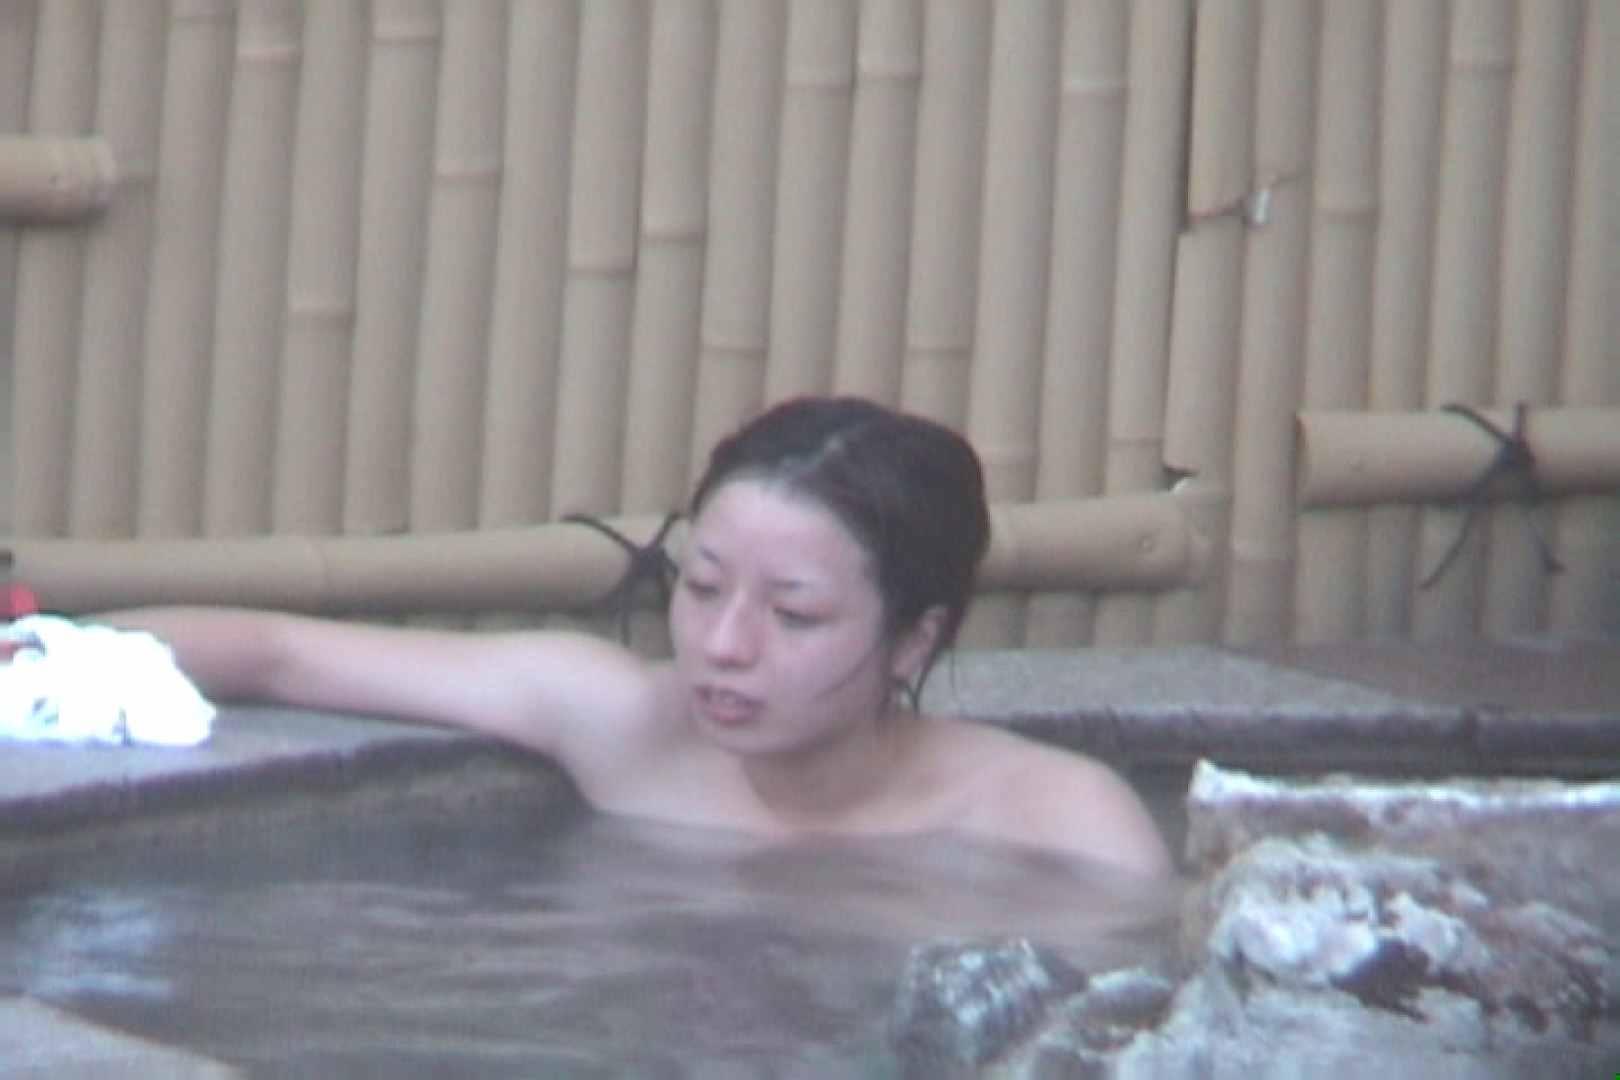 Aquaな露天風呂Vol.608 HなOL | 盗撮  89pic 47